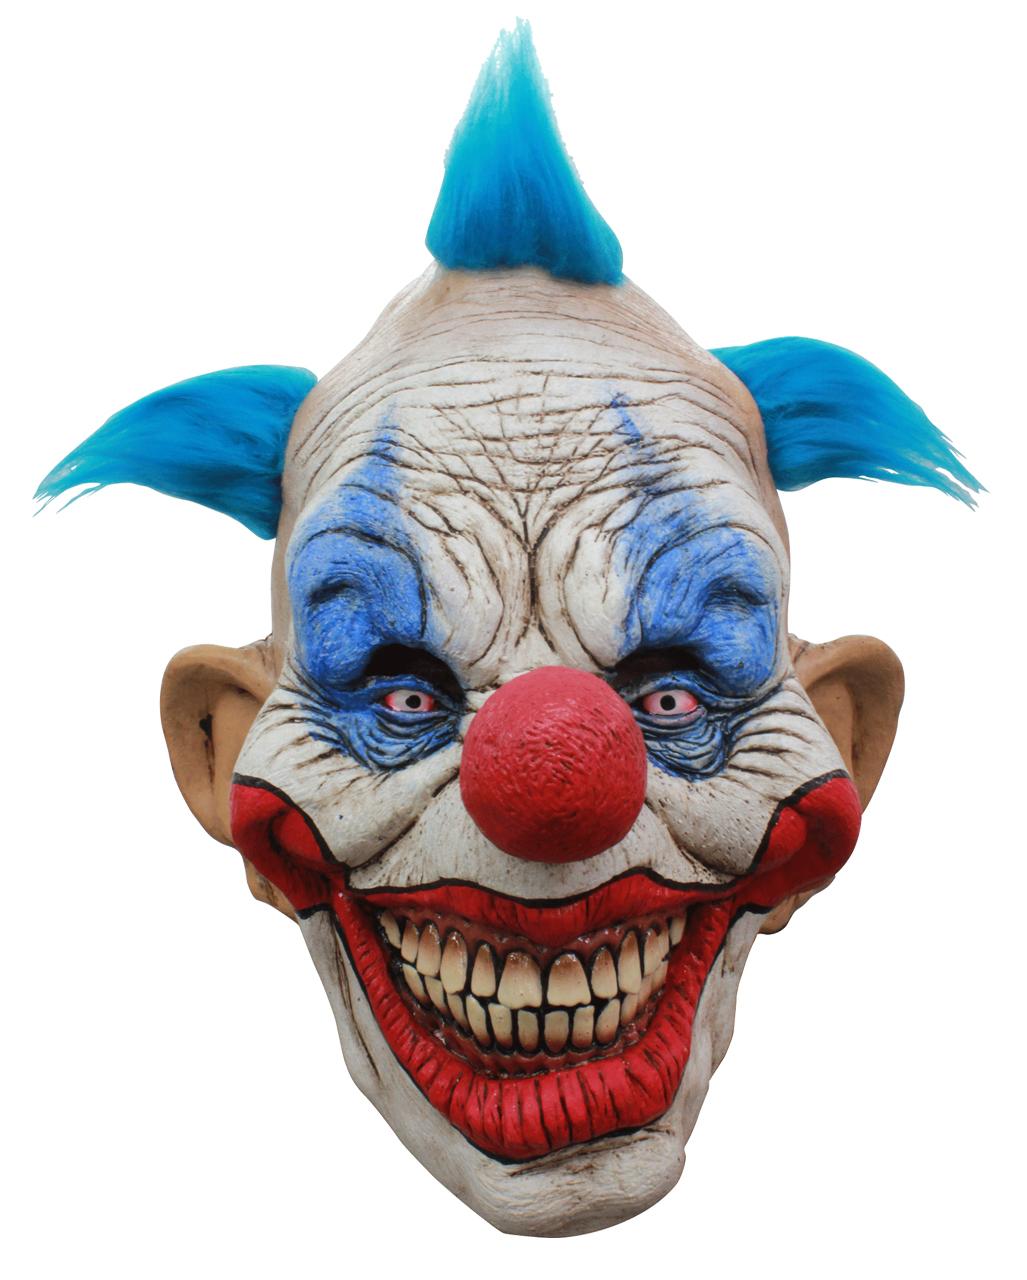 5507365db Scary Killer Clown Mask Horror Mask | horror-shop.com